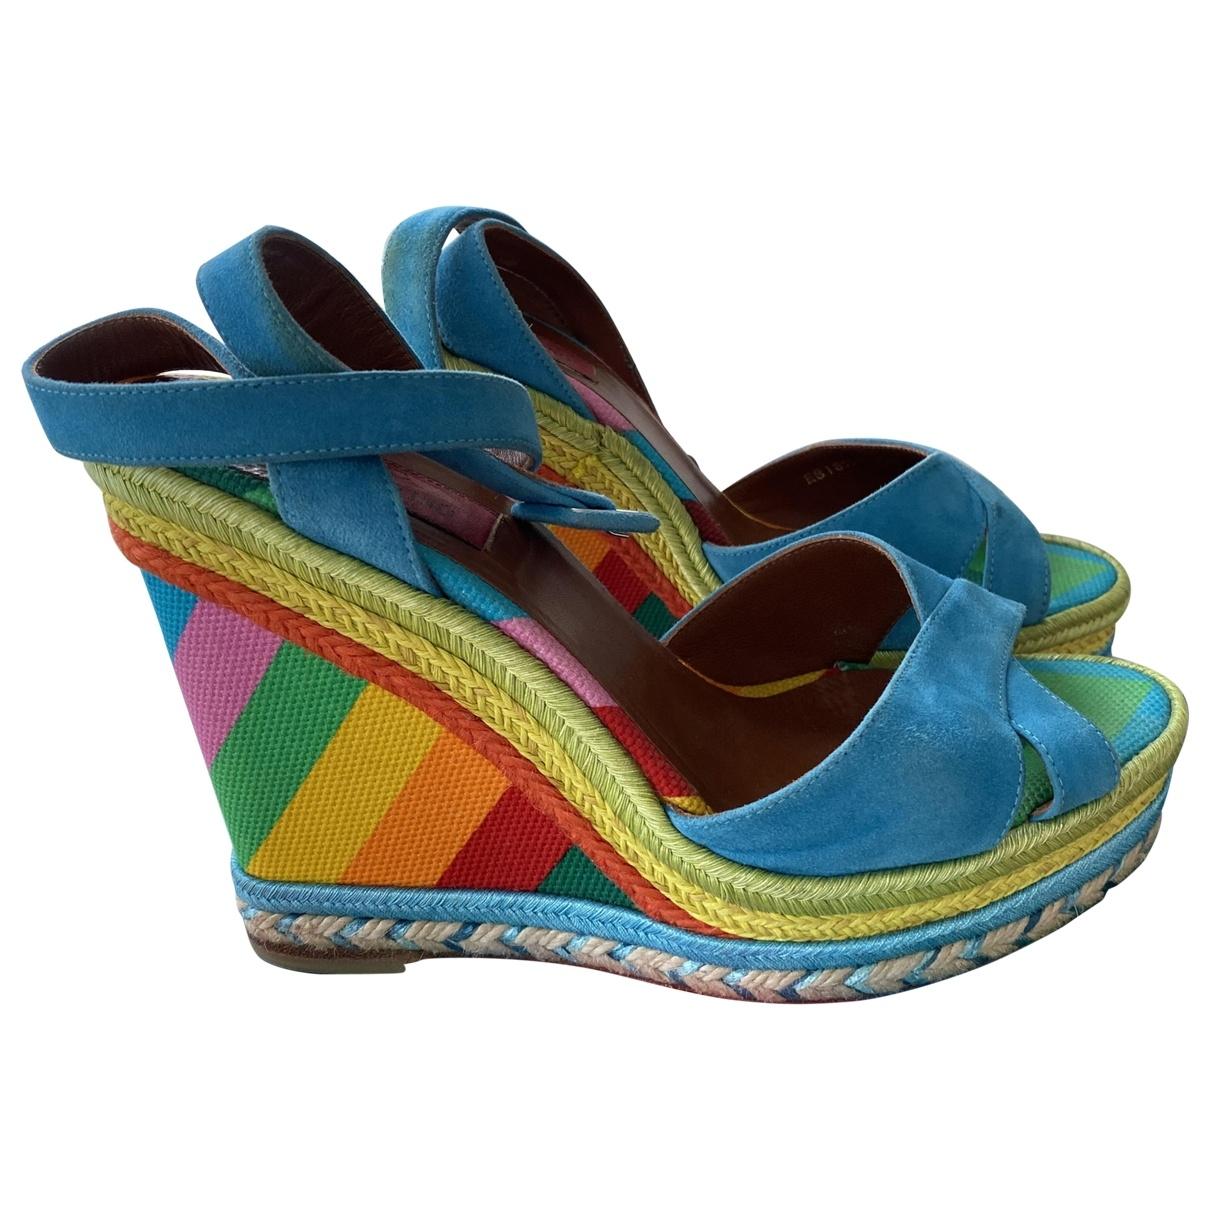 Valentino Garavani \N Multicolour Suede Sandals for Women 38 EU